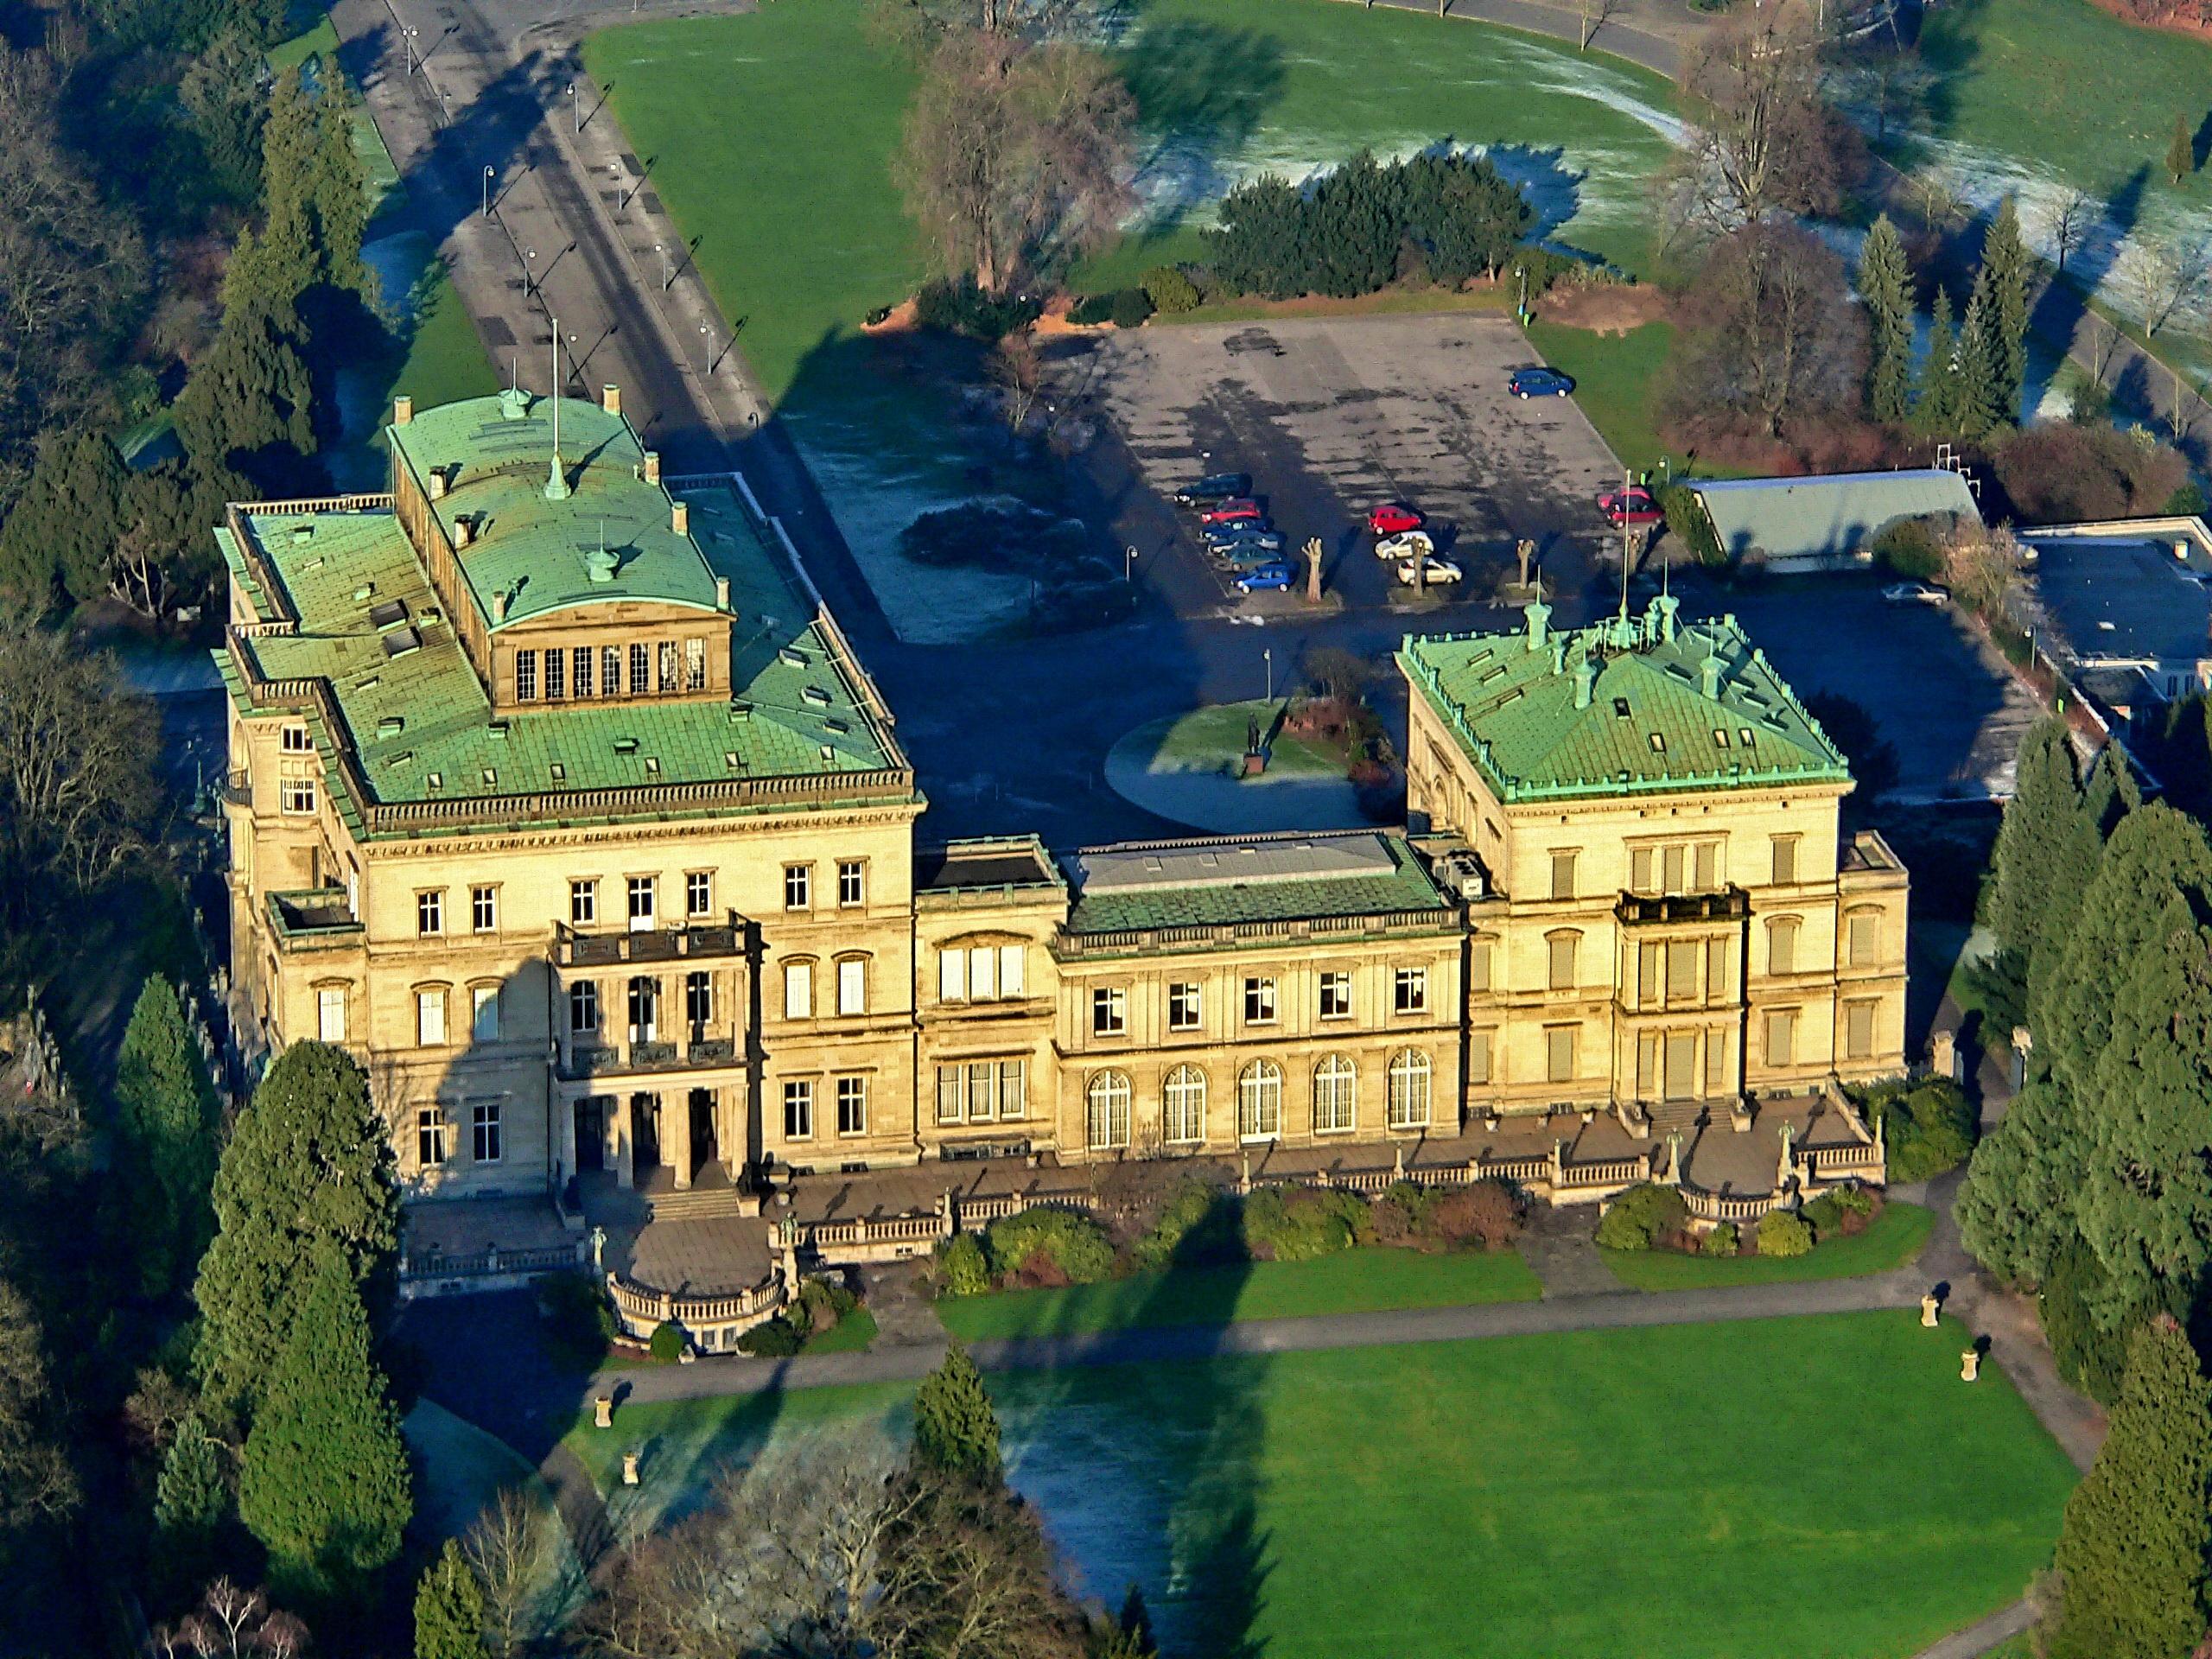 Villa Huegel em Essen, Alemanha / Wikimedia commons